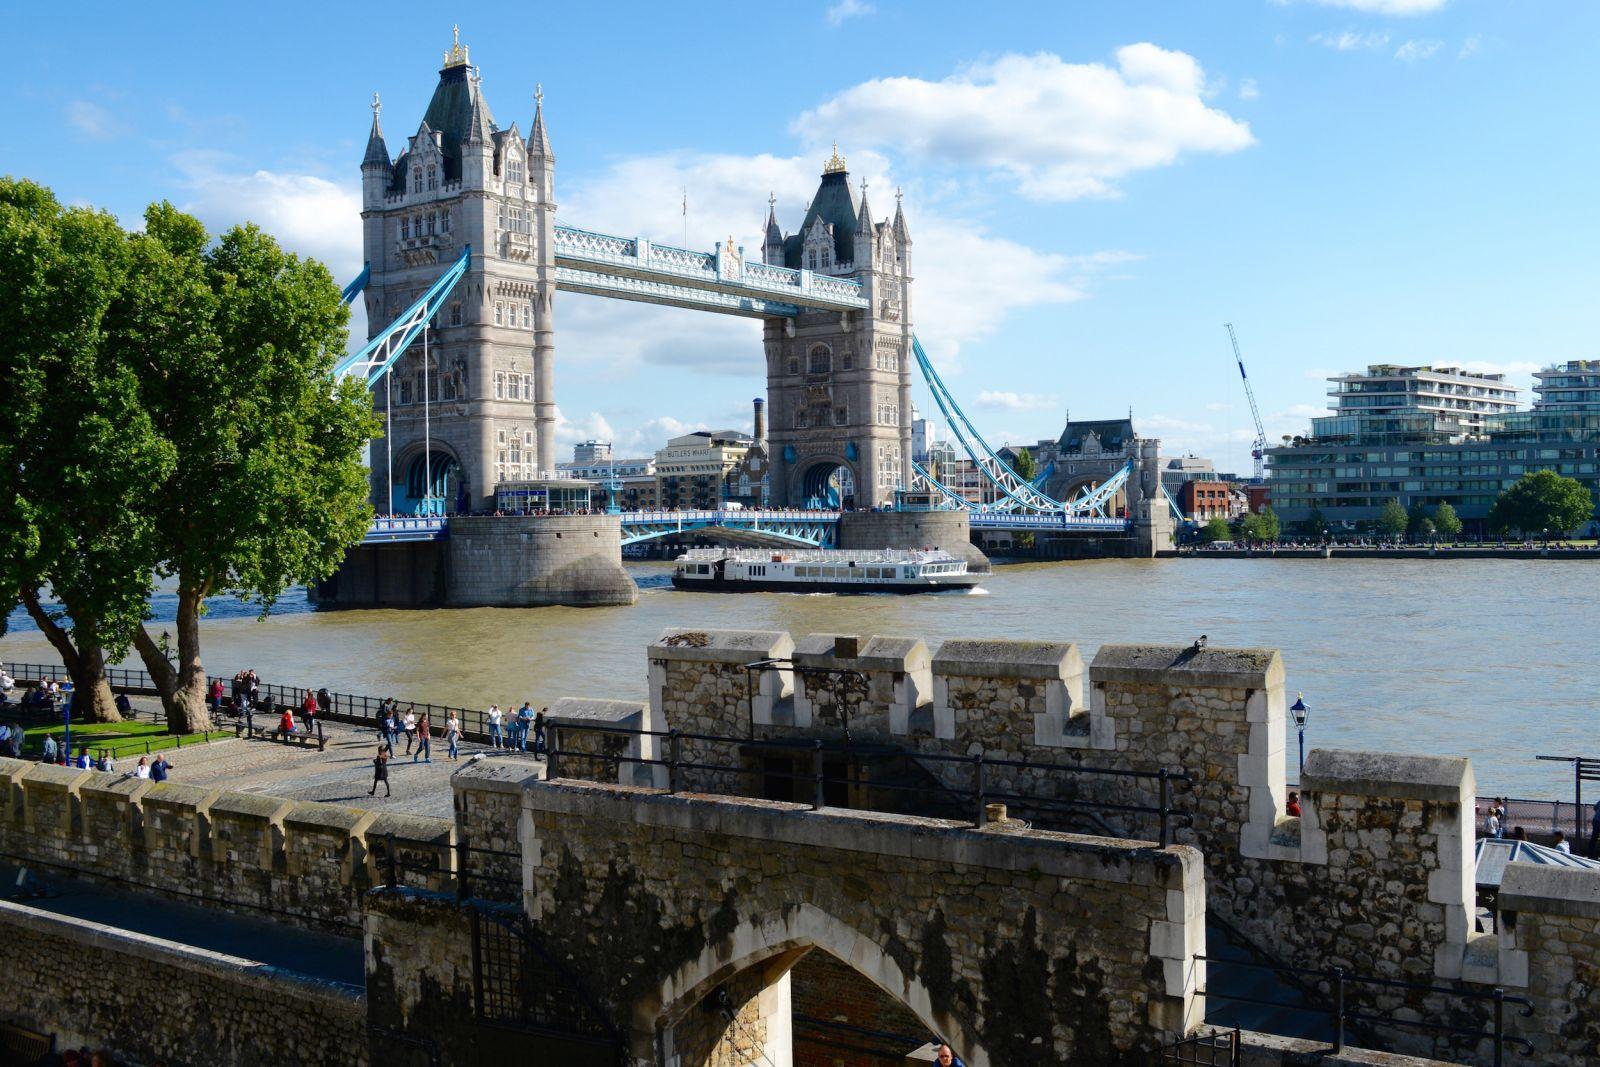 tower-bridge-view